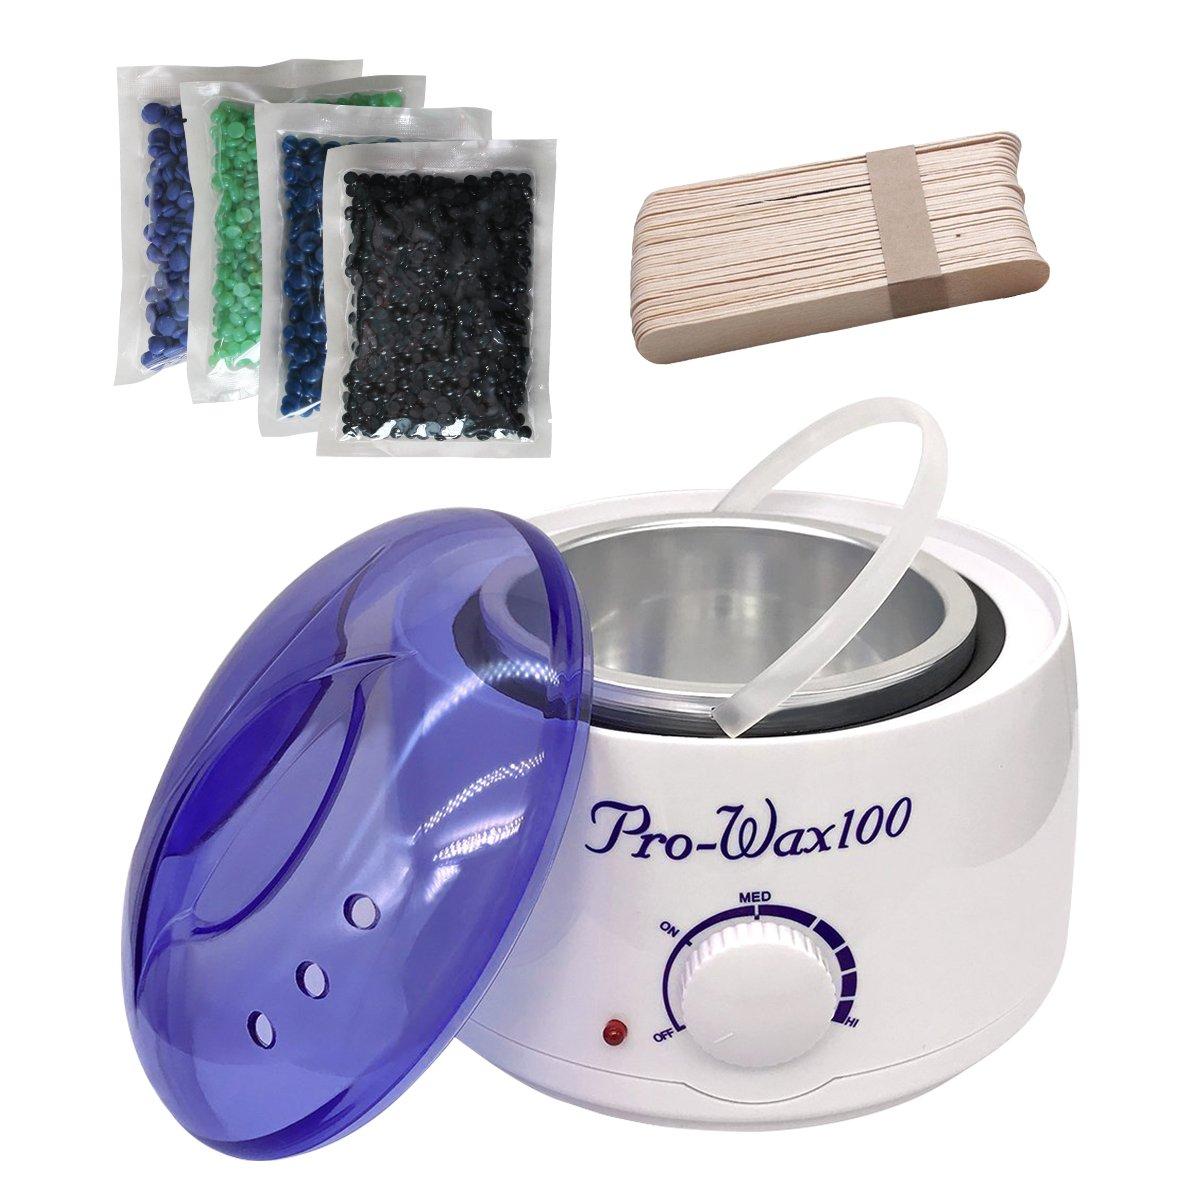 Wax for Legs, Wax Strips Wax Warmer Wax Heater Pot Hair Removal Waxing Kit for Face Legs Underarms & Bikini Hair Remover+Wax Beads 400g+30pcs Waxing Applicator Stick (400ml) (White) Breett